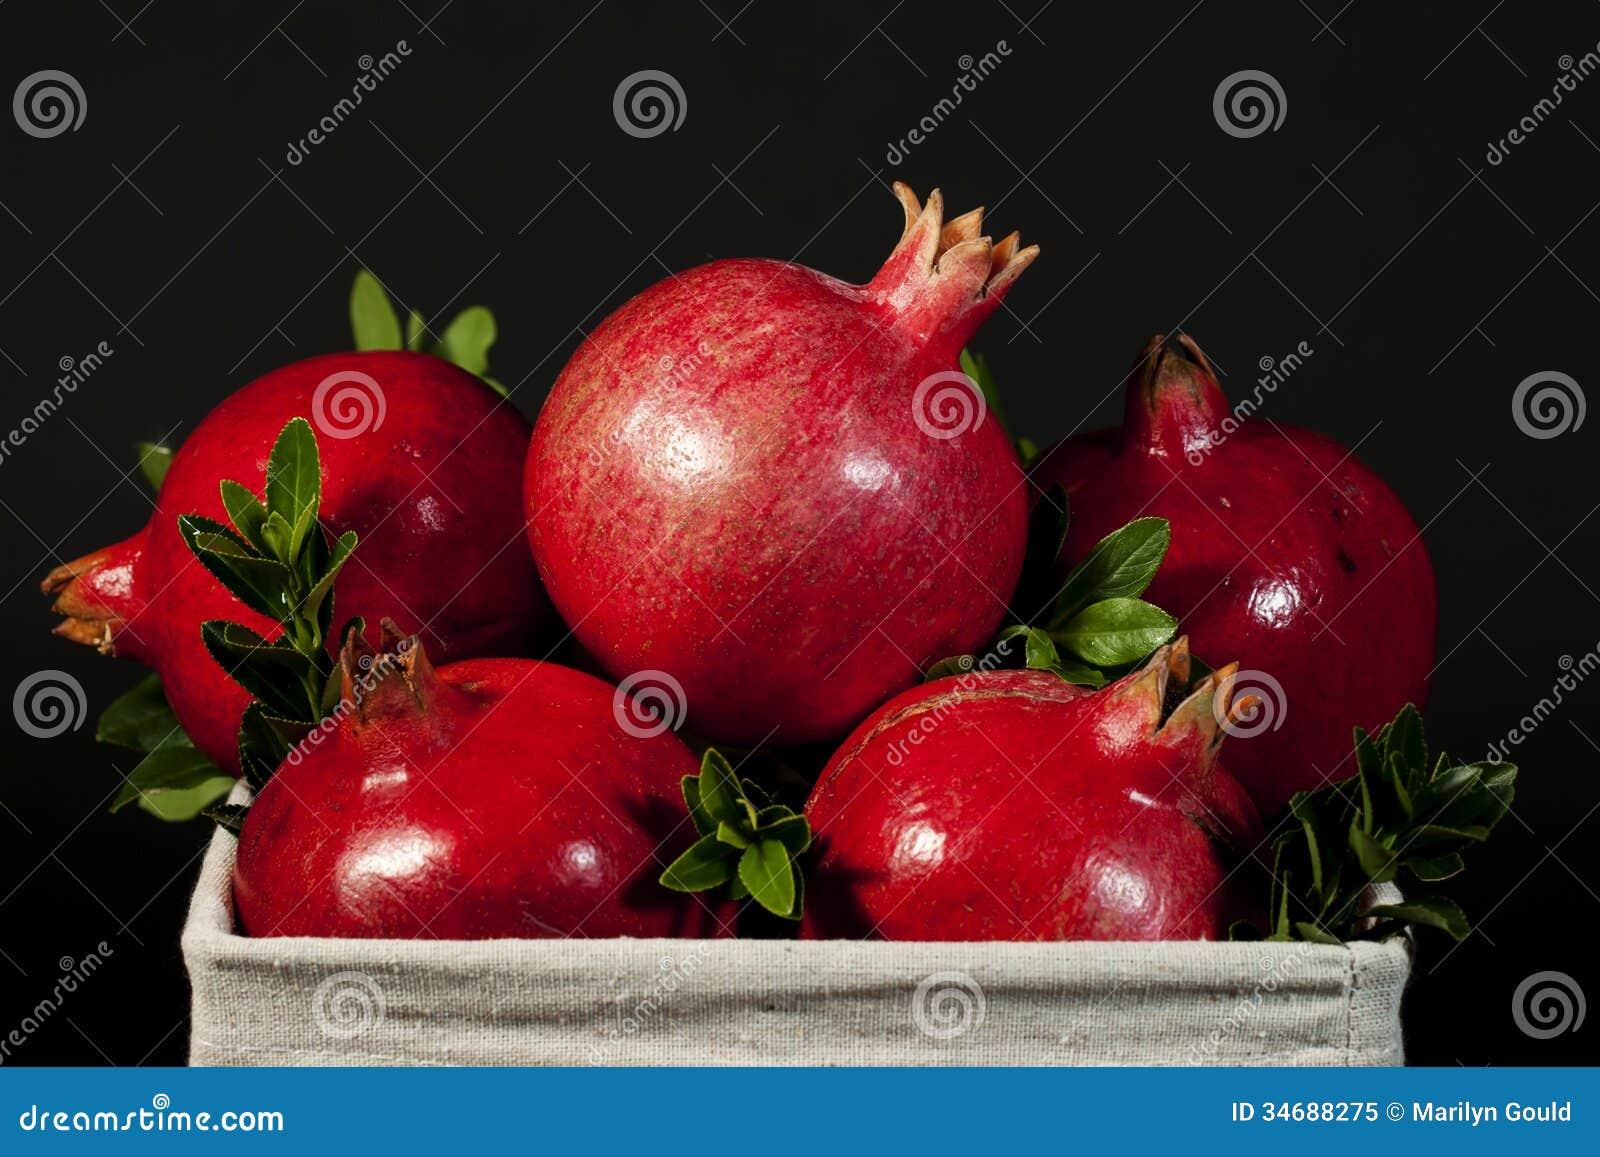 Fruits entiers de grenade photo libre de droits image 34688275 - Acheter des grenades fruits ...